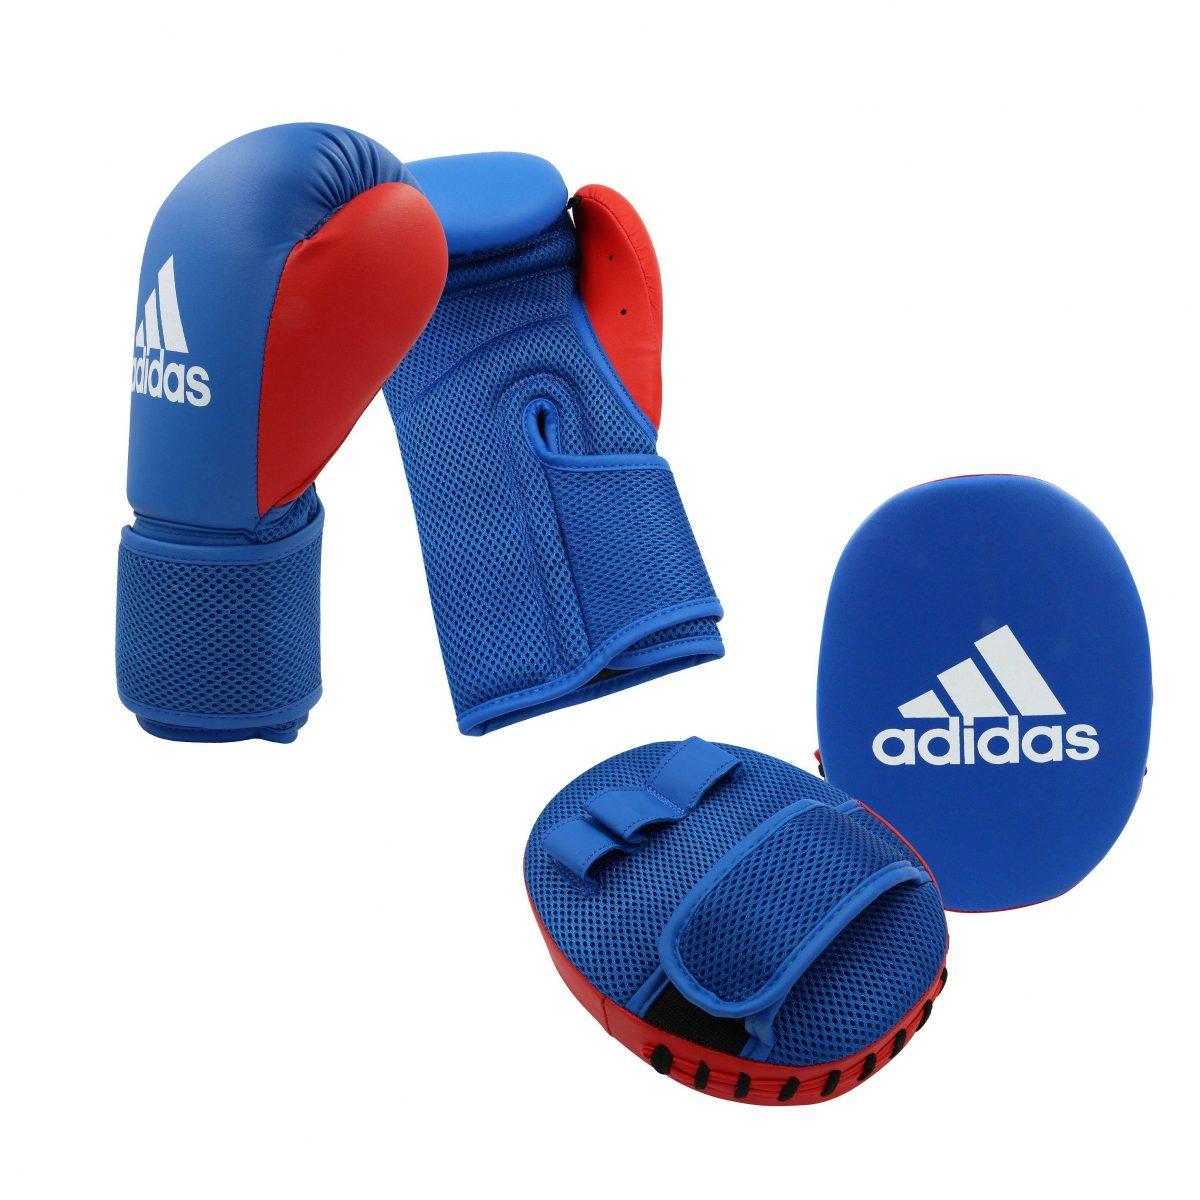 Adidas Boxing Kit